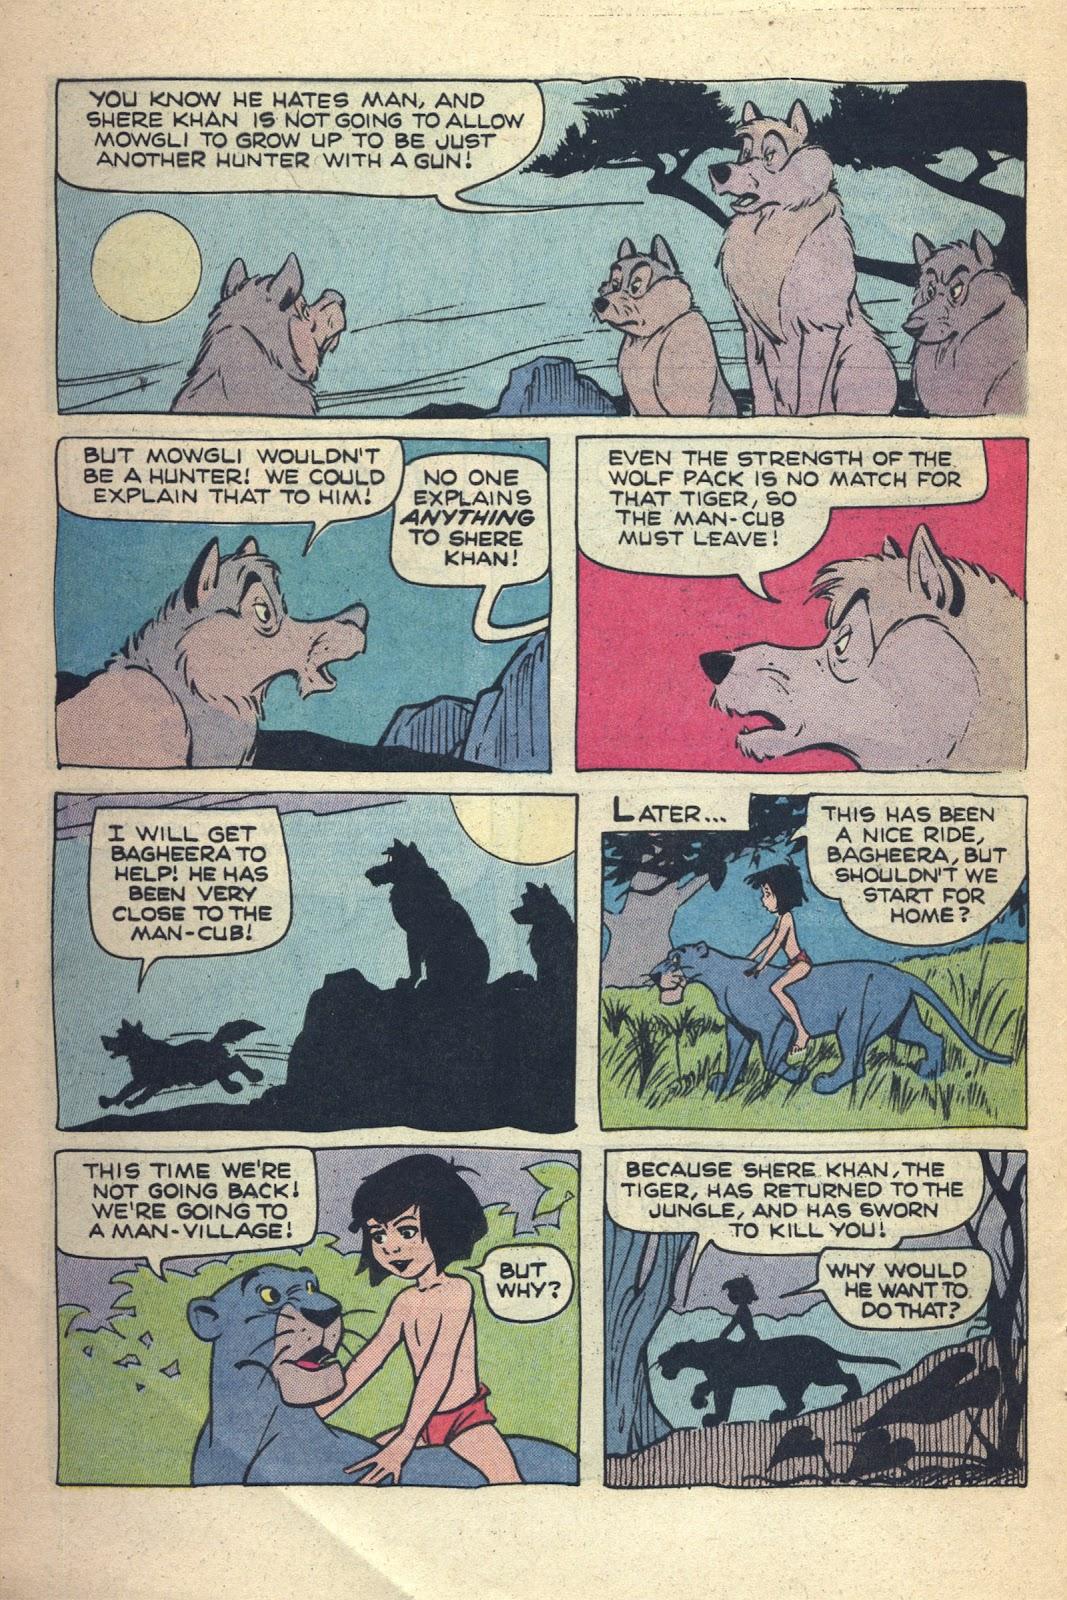 Read online Walt Disney presents The Jungle Book comic -  Issue # Full - 7